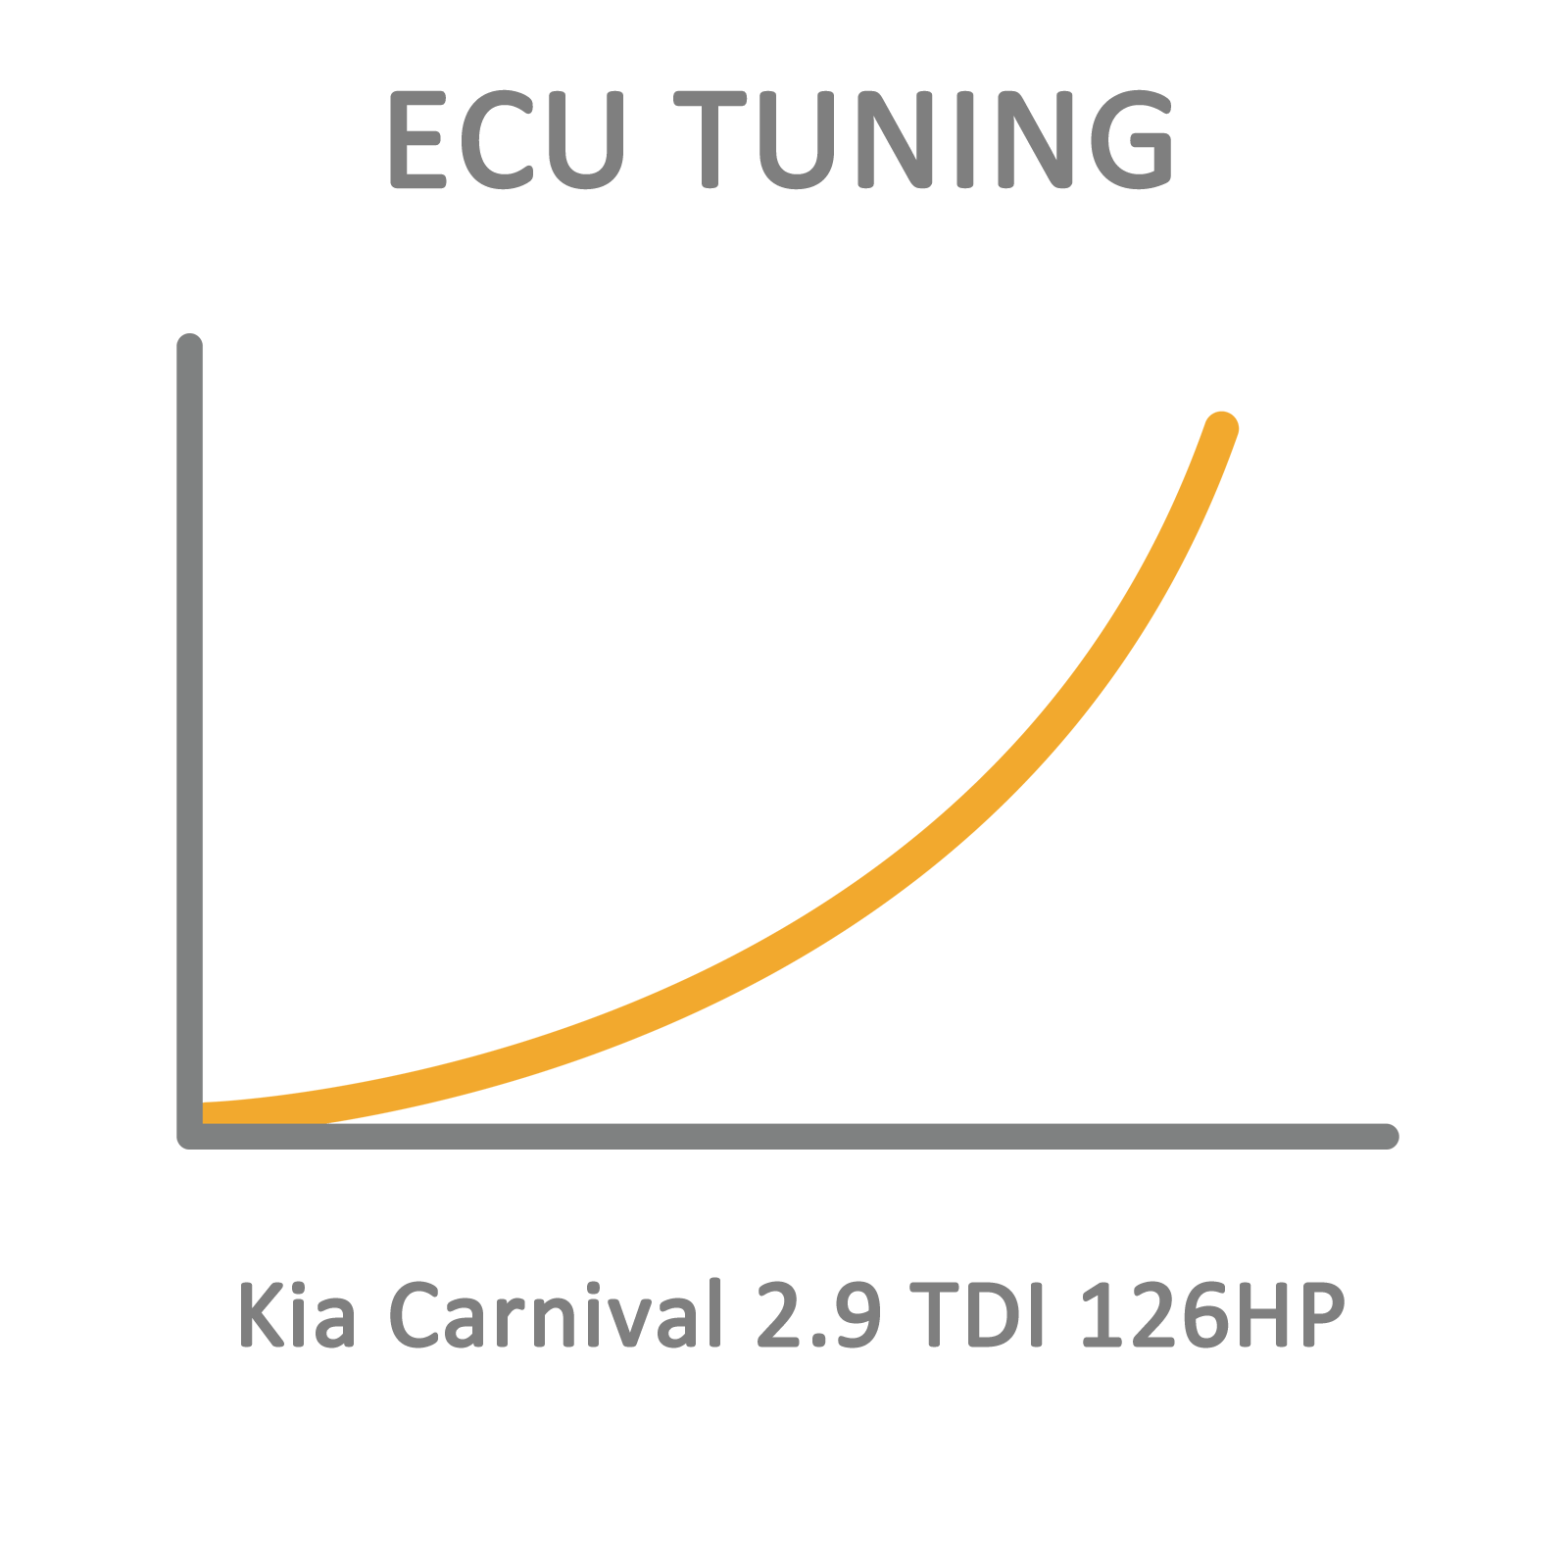 Kia Carnival 2.9 TDI 126HP ECU Tuning Remapping Programming